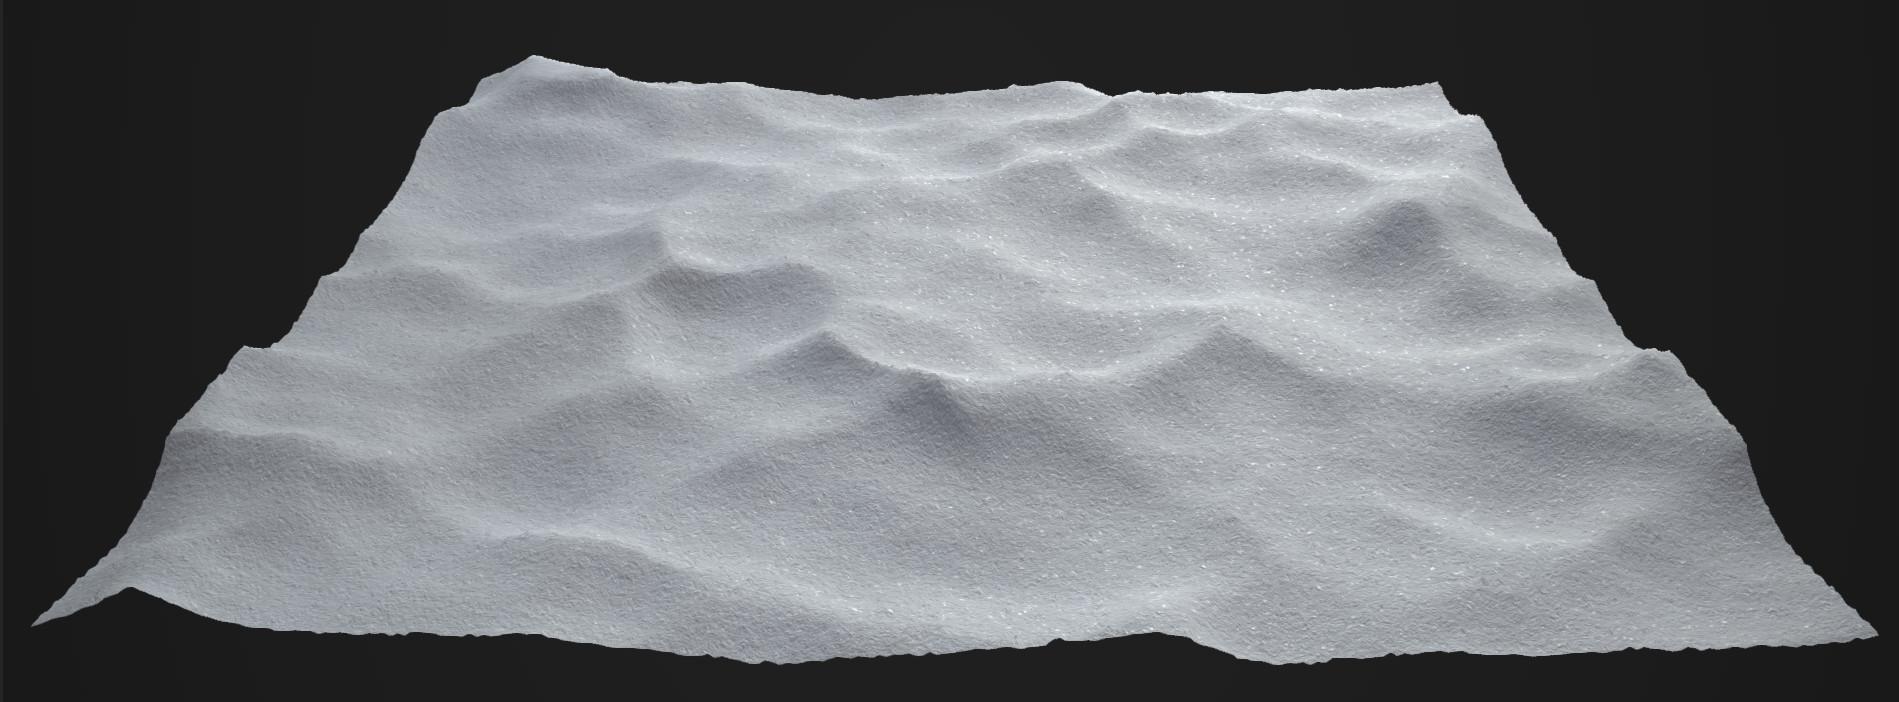 Osman samano snow1